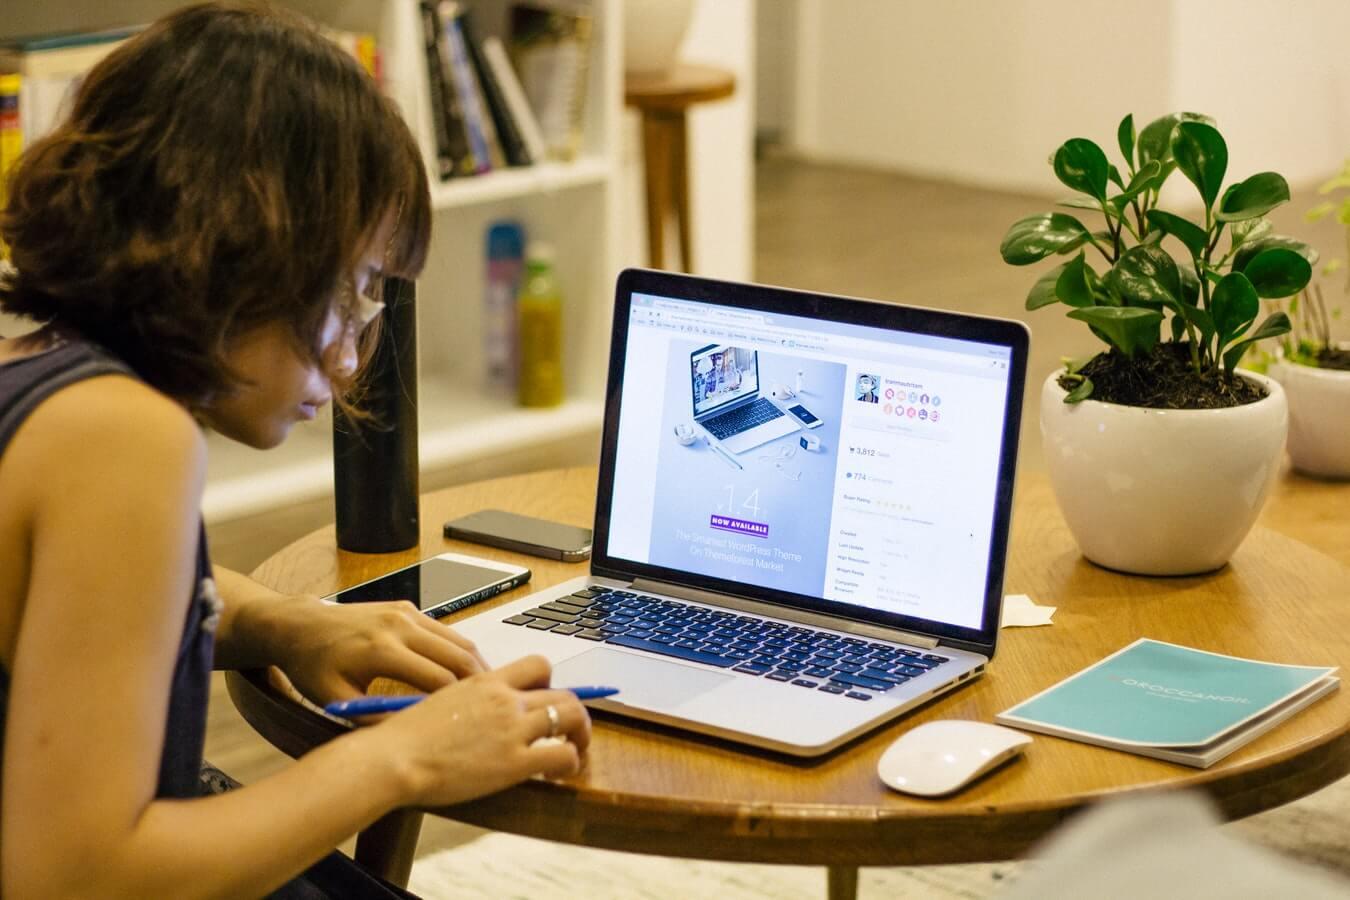 Как найти работу в Интернете без обмана?